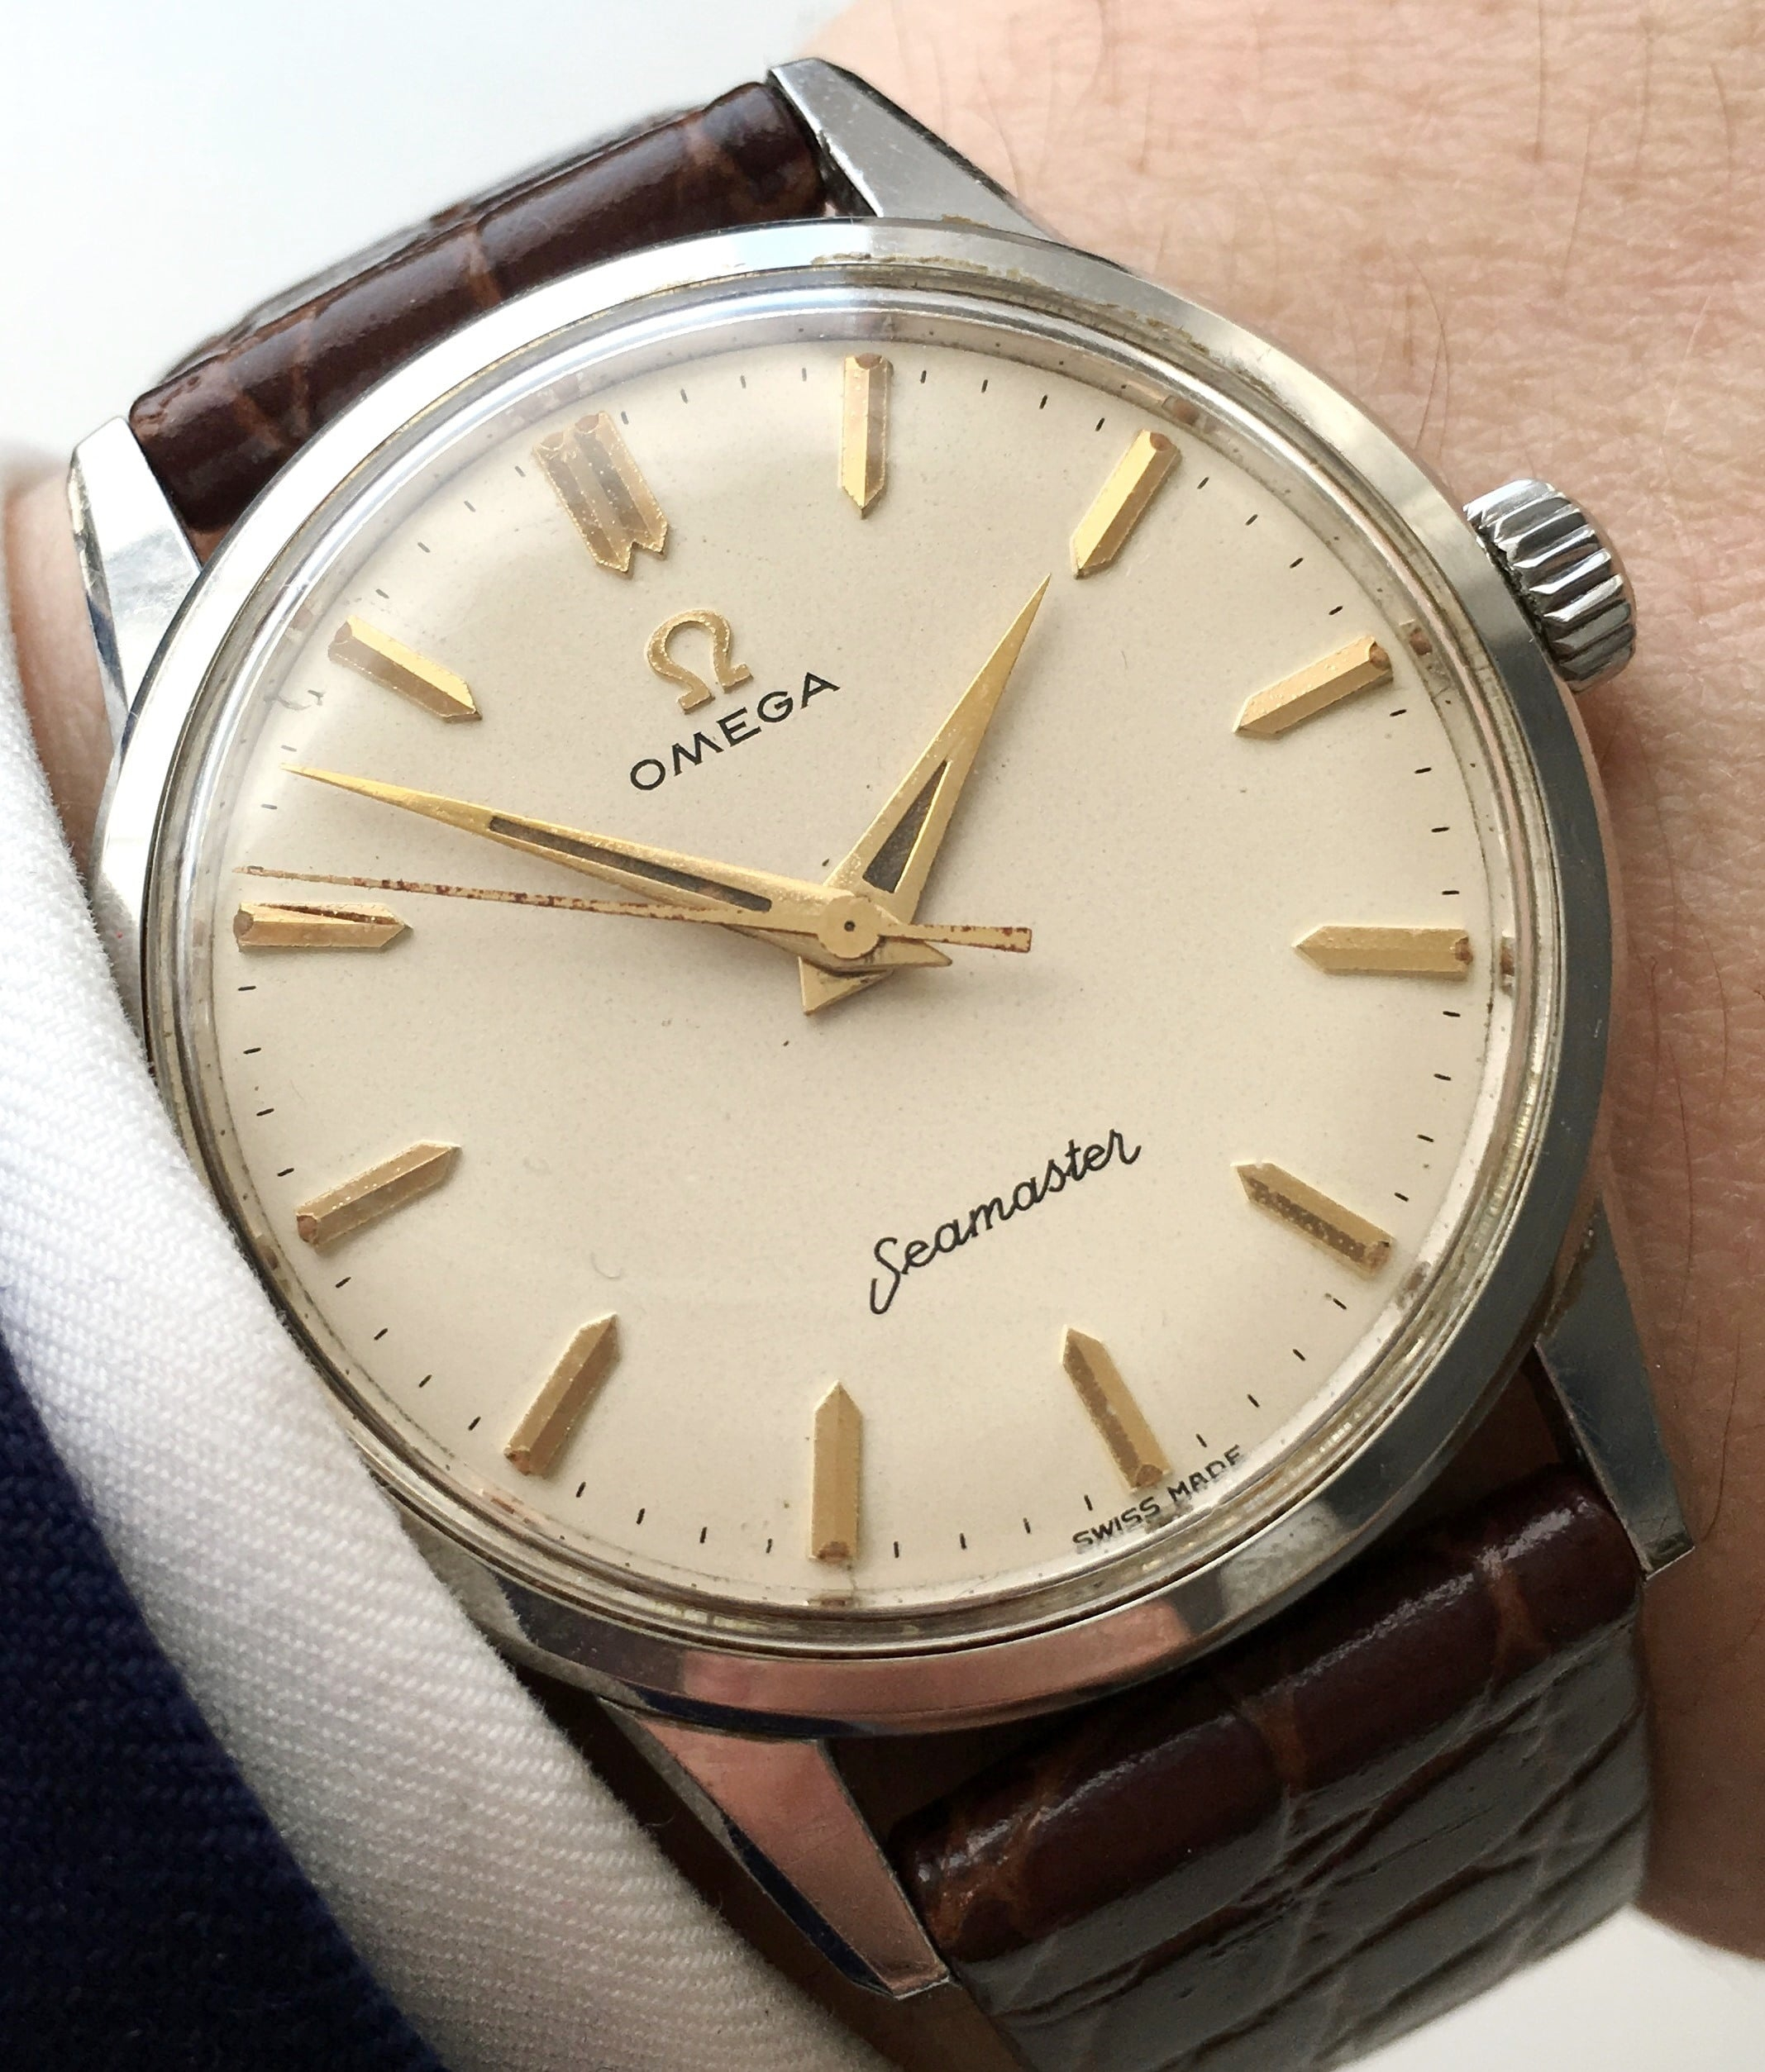 Mint massive 35mm omega seamaster vintage watch vintage portfolio for Omega watch vintage